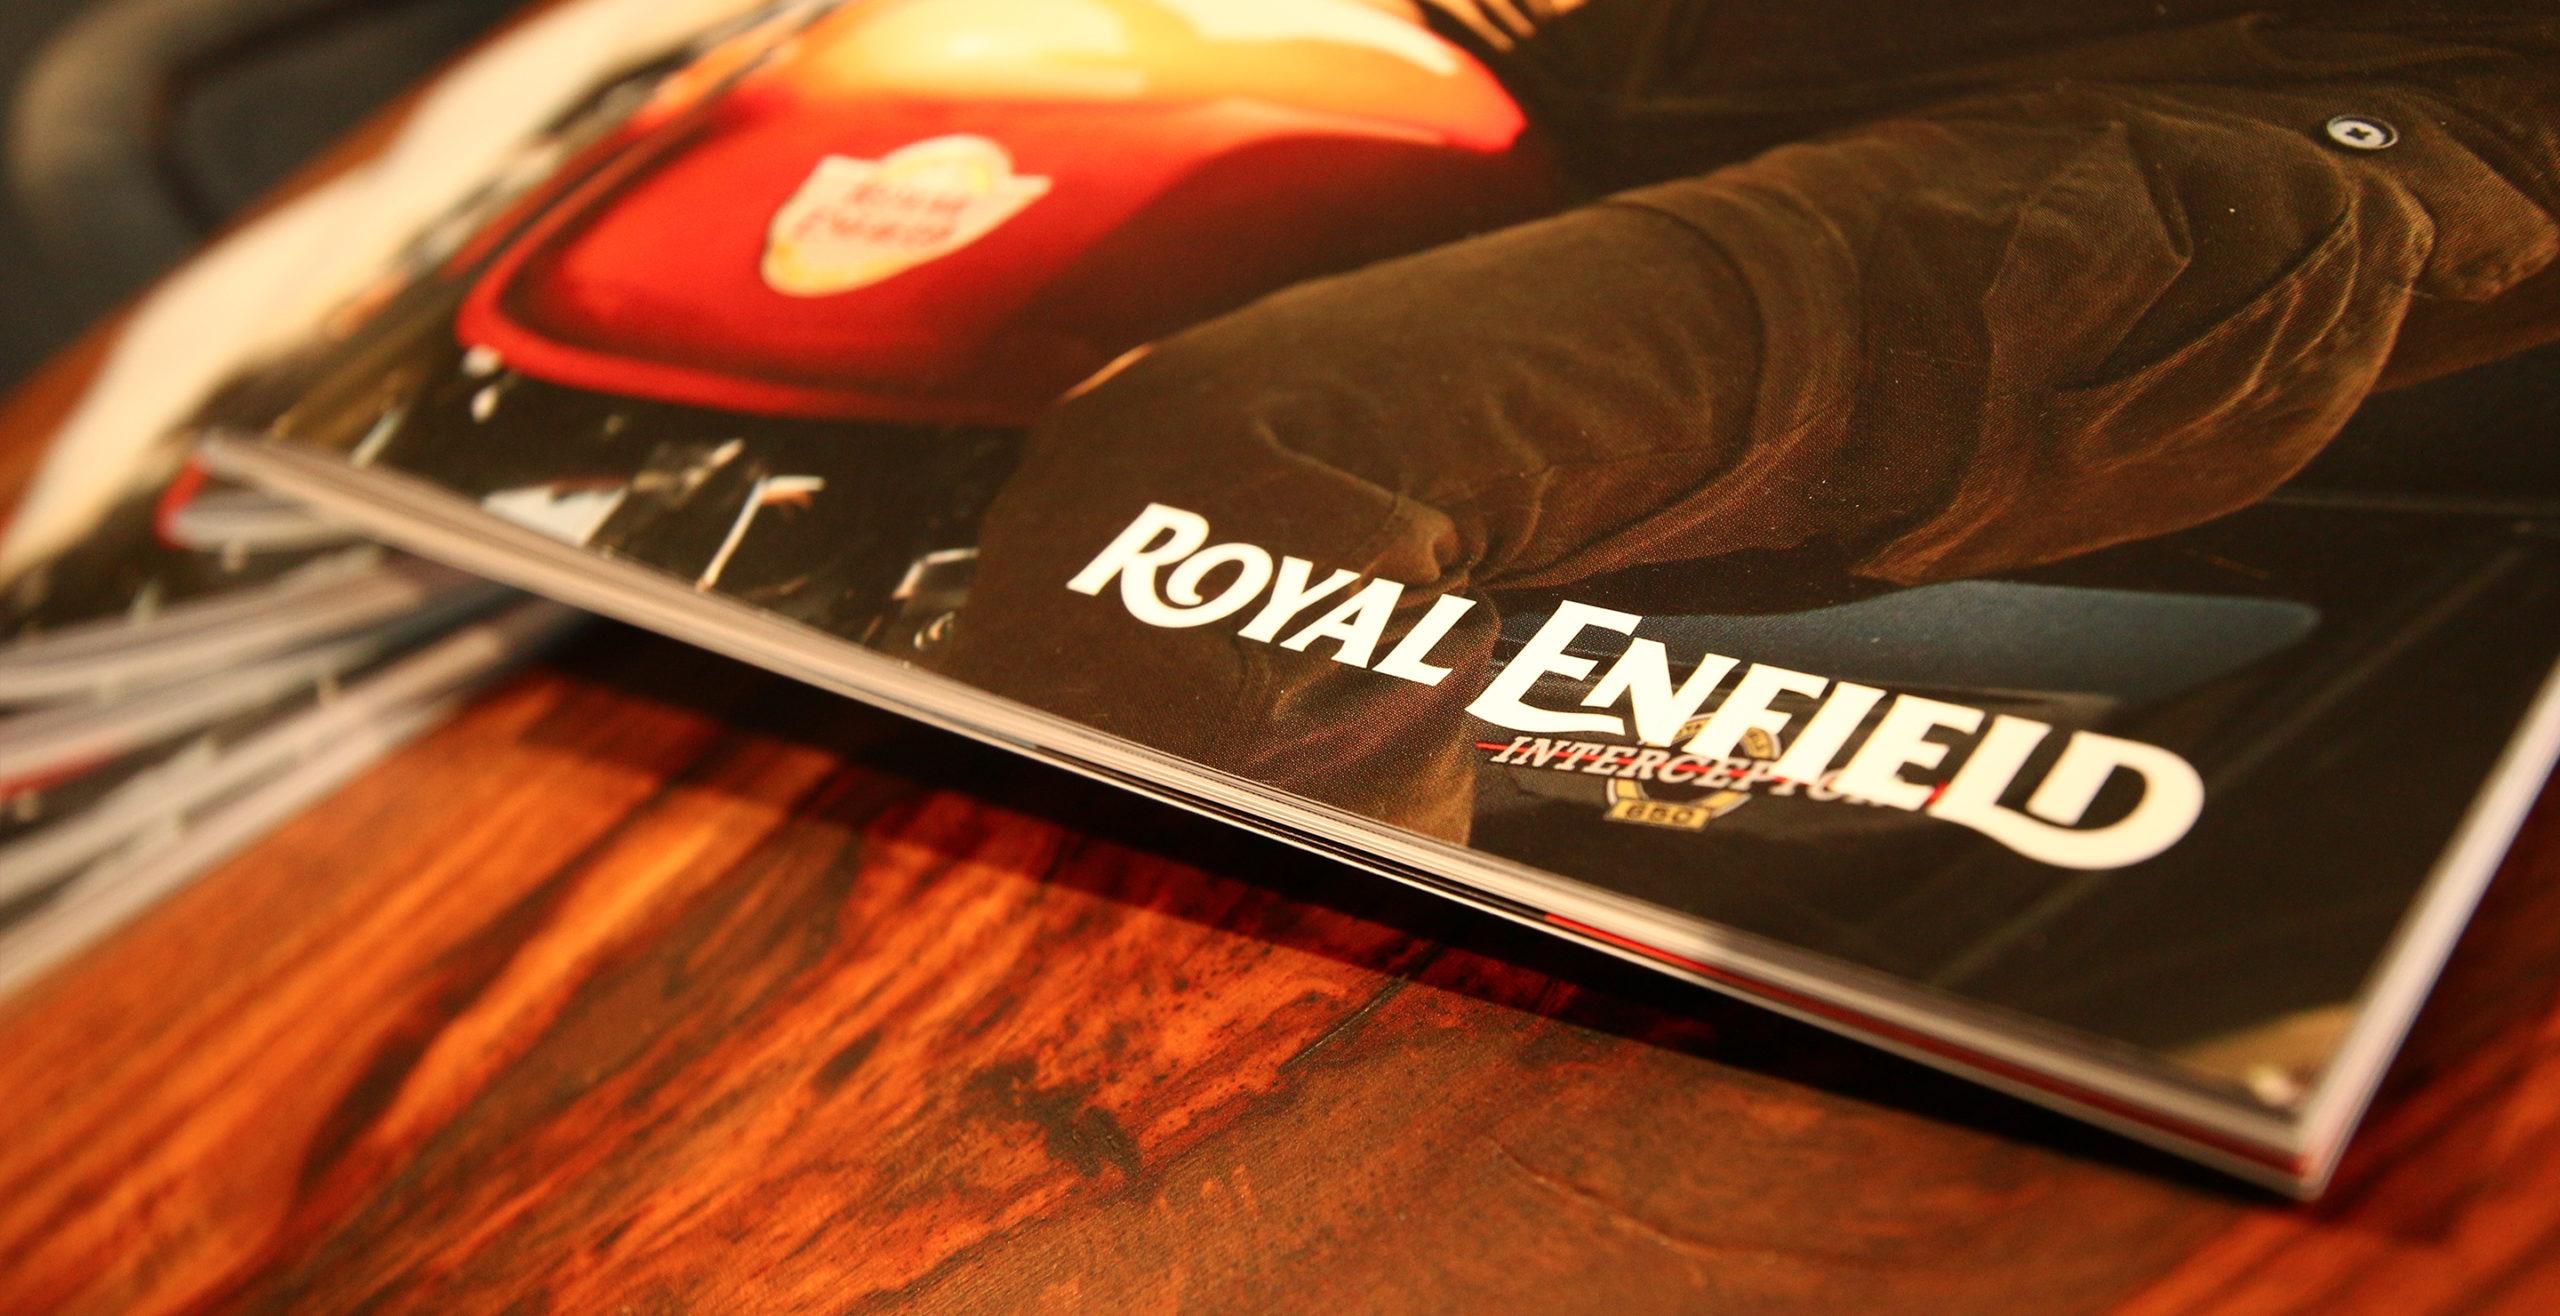 Detalle de catálogo de moto de la marca Royal Enfield sobre mesa de madera